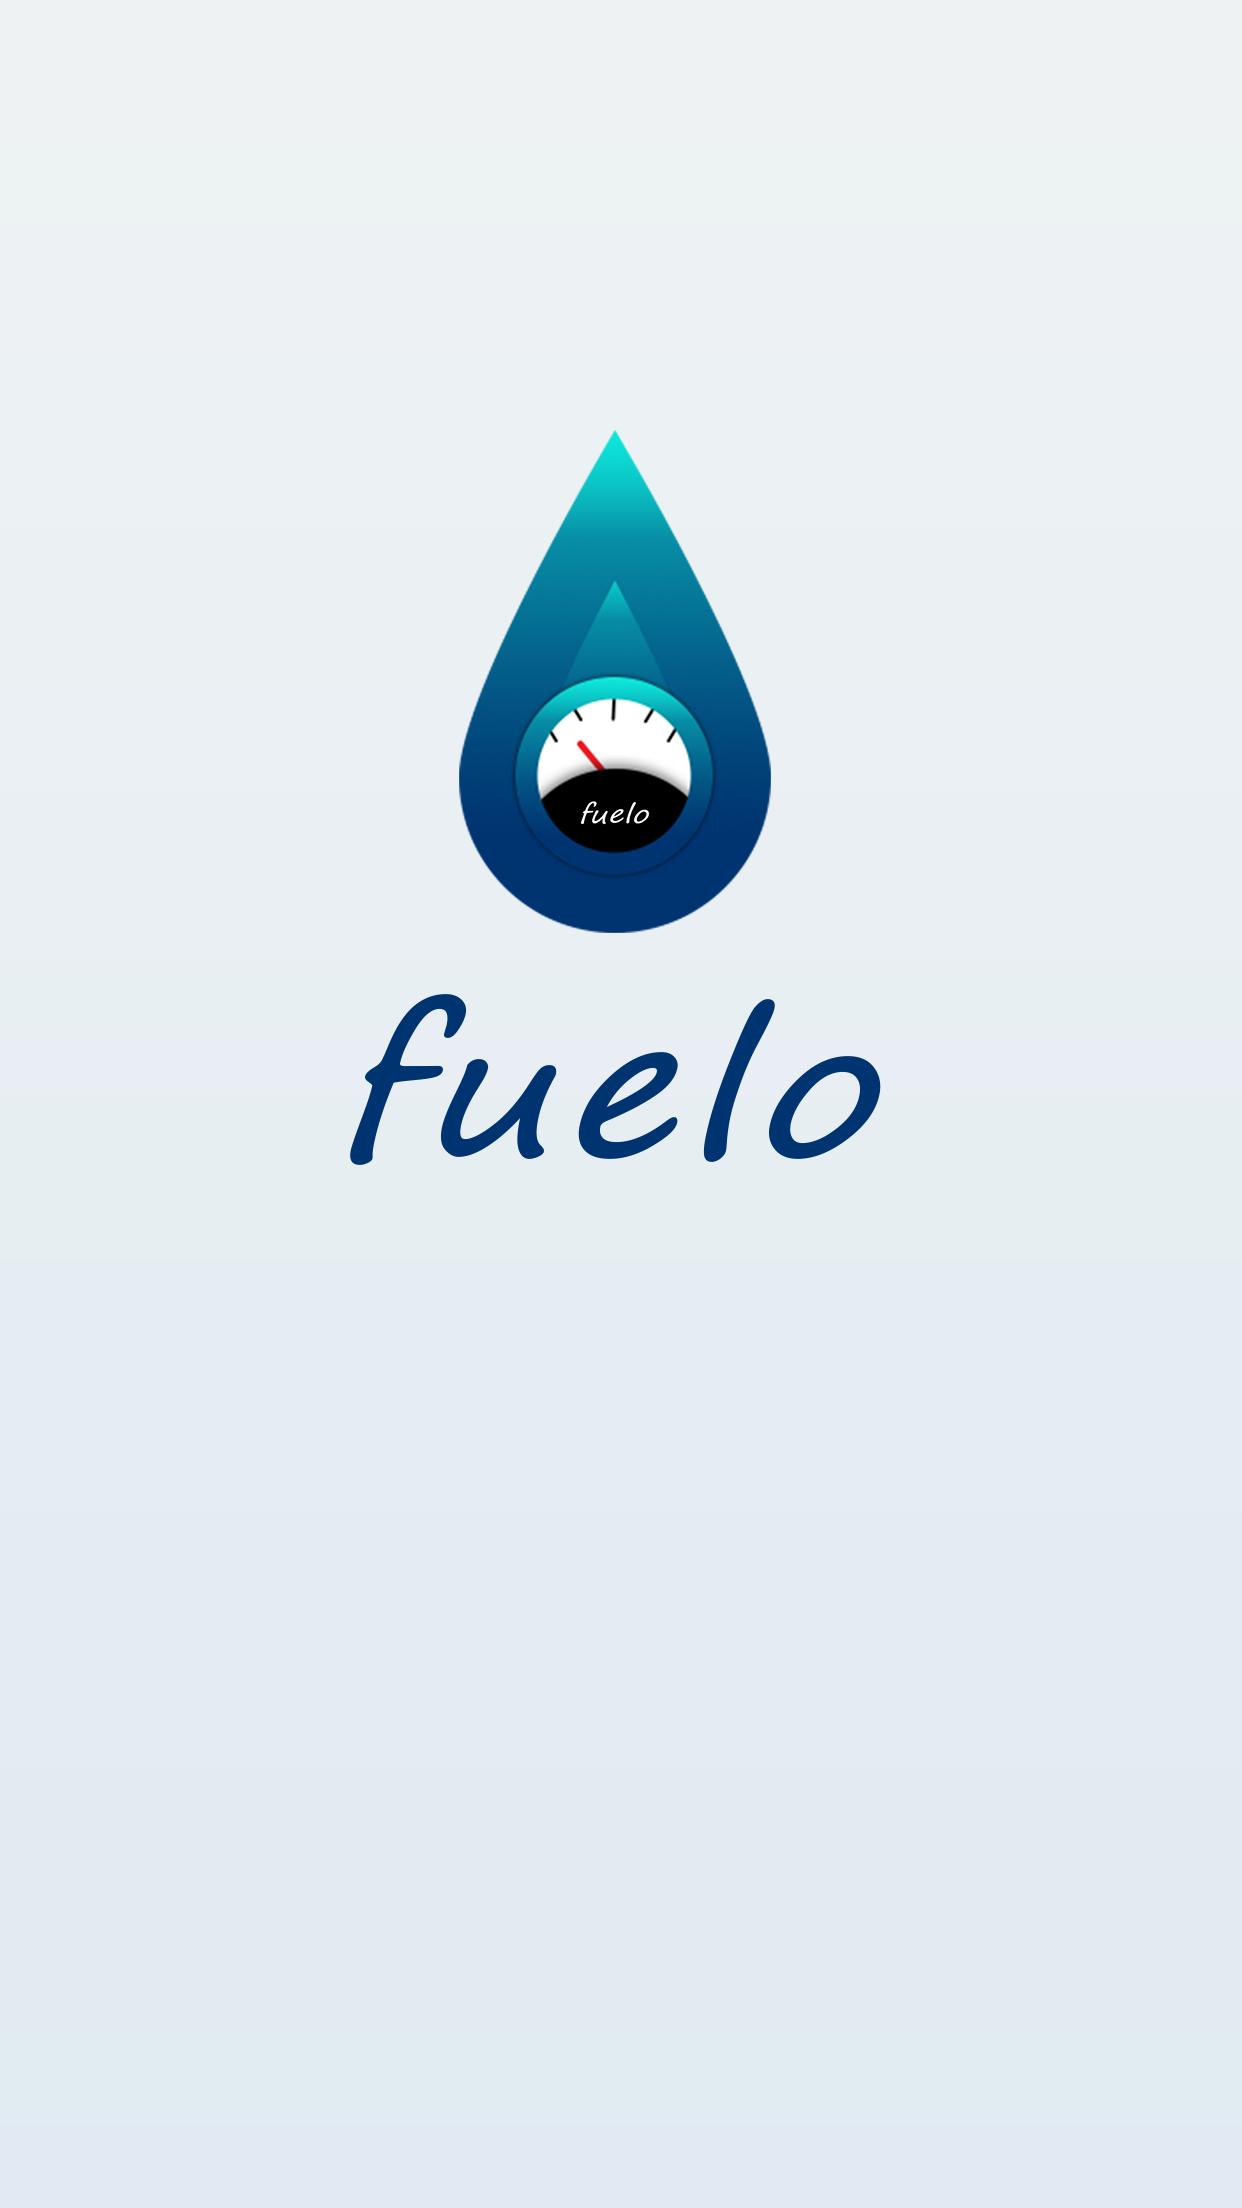 Fuelo - Consumption Tracker